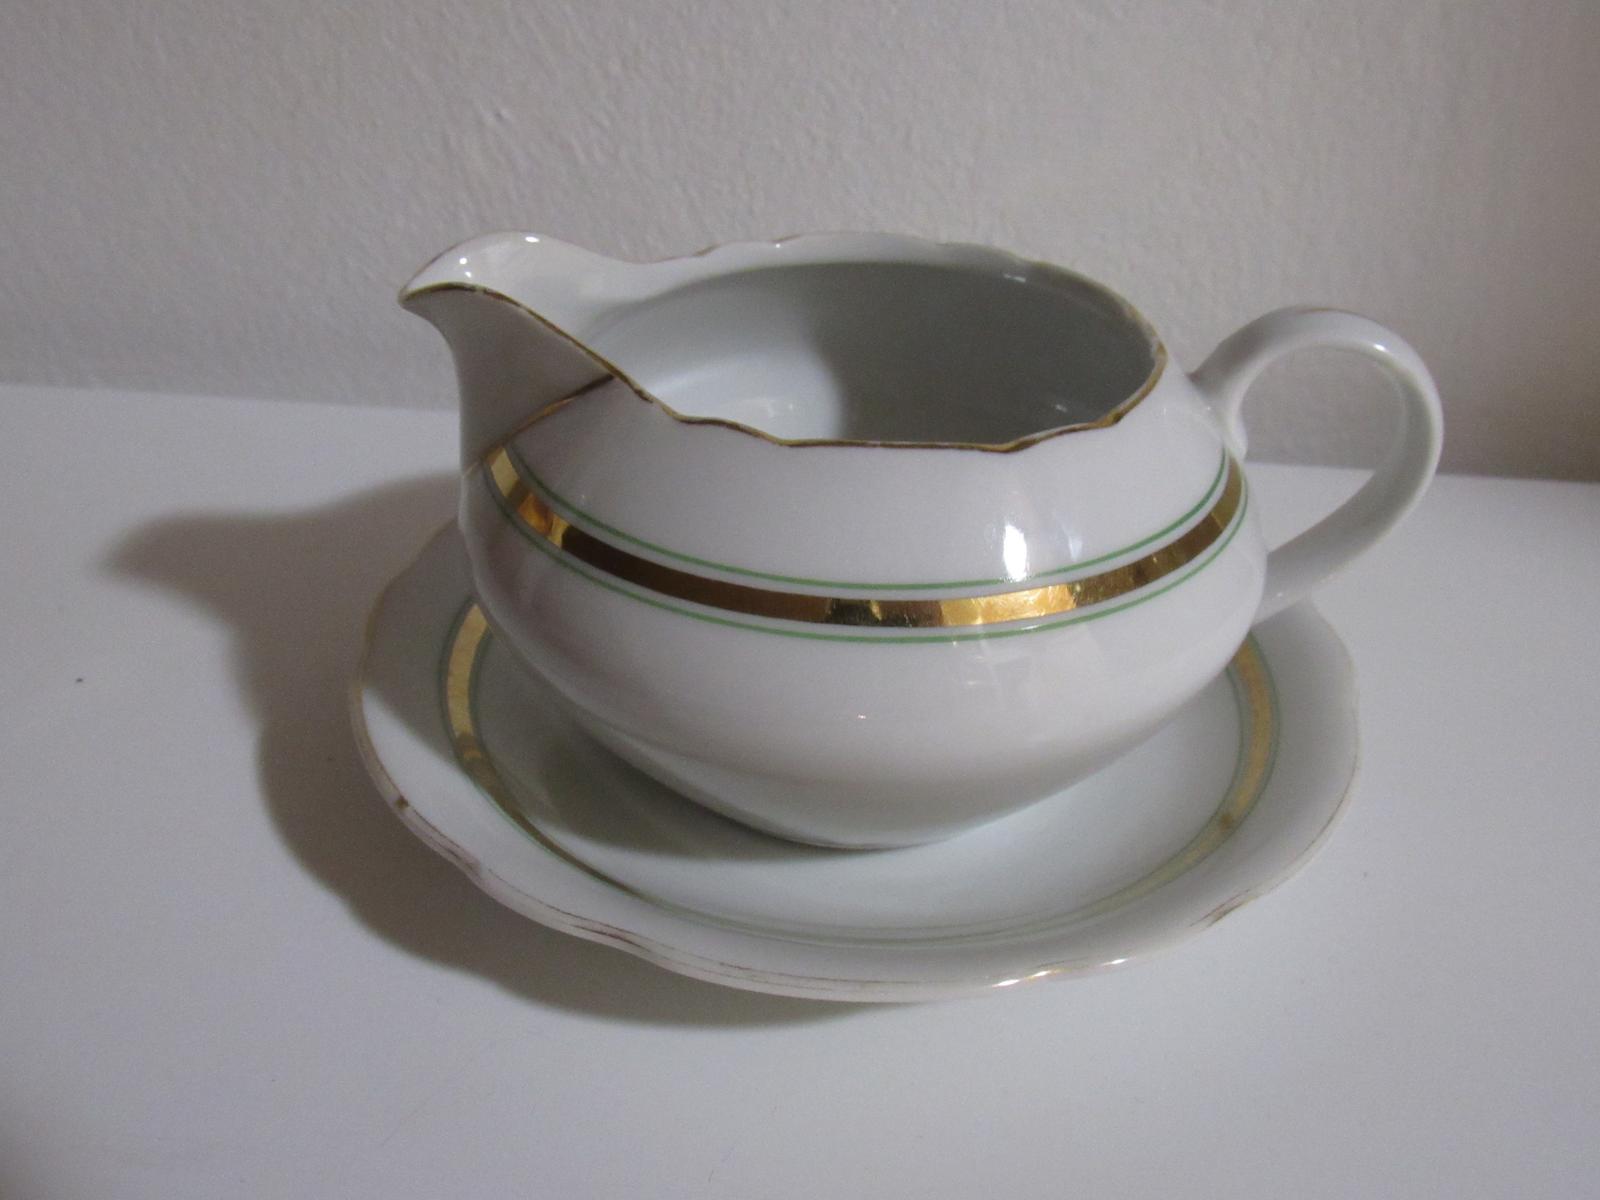 Mliečnik s tanierikom - Obrázok č. 1